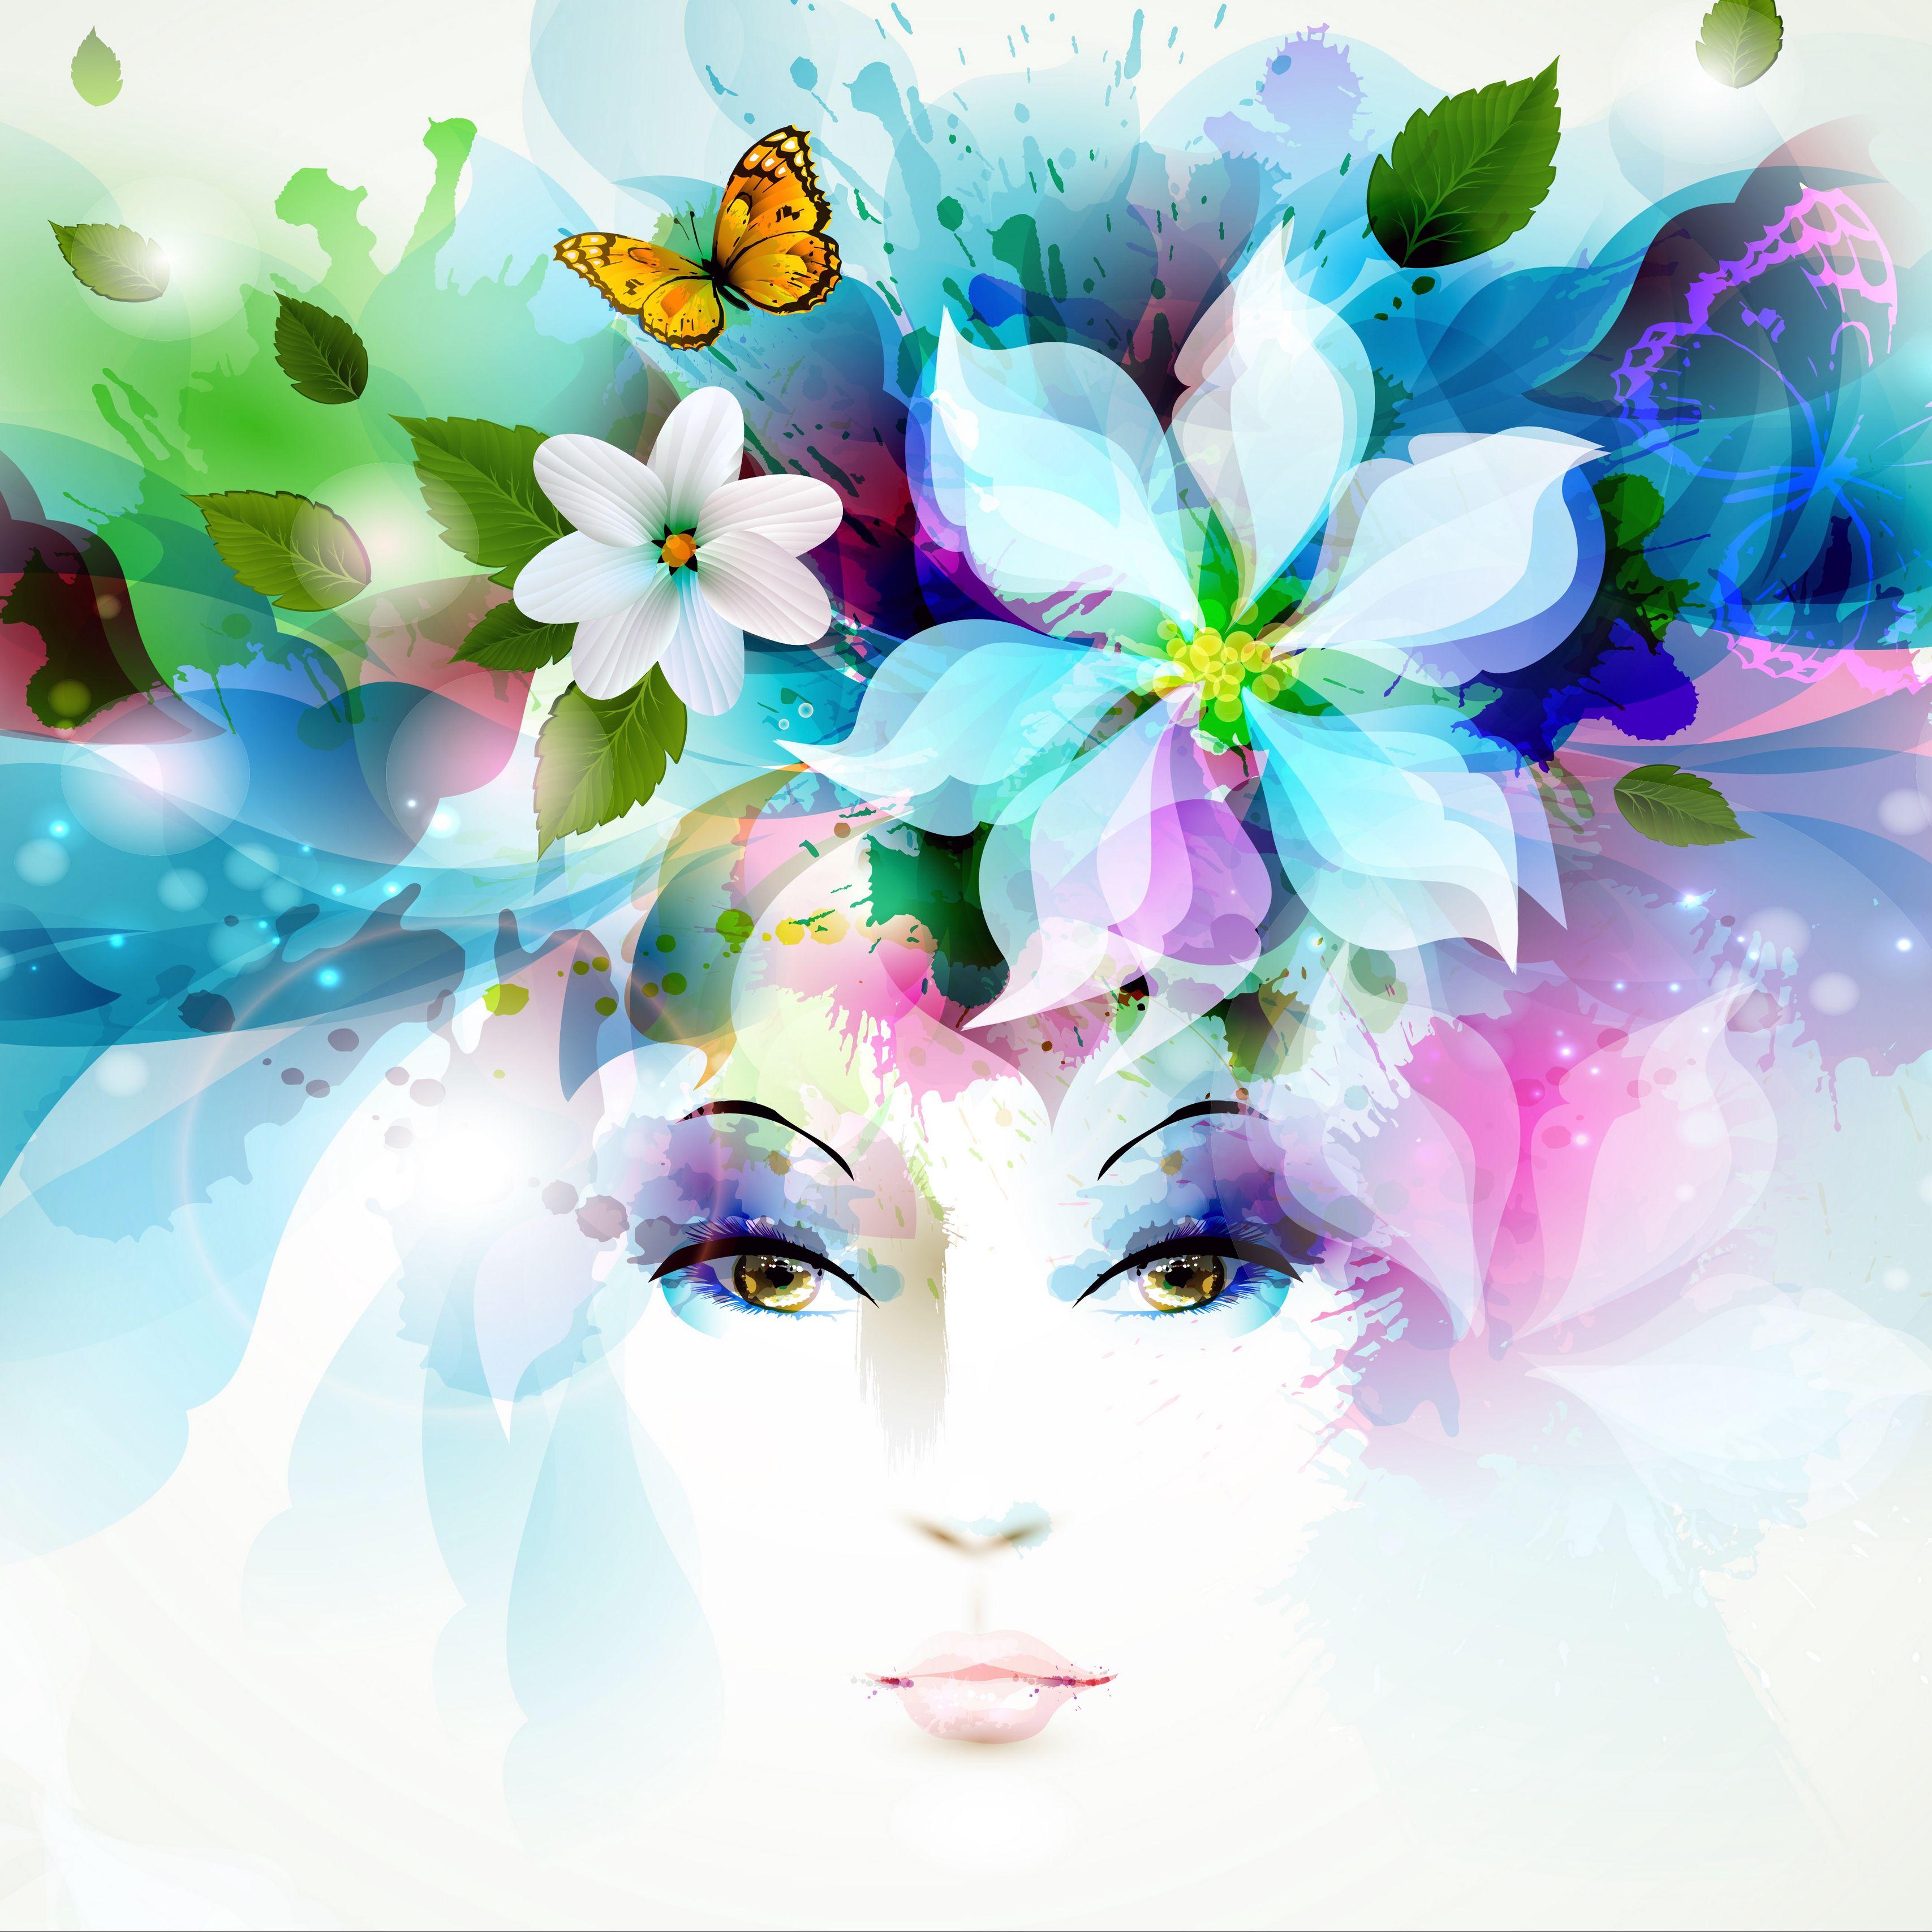 3415x3415 Wallpaper art, girl, eyes, flowers, petals, butterfly, leaves, spray